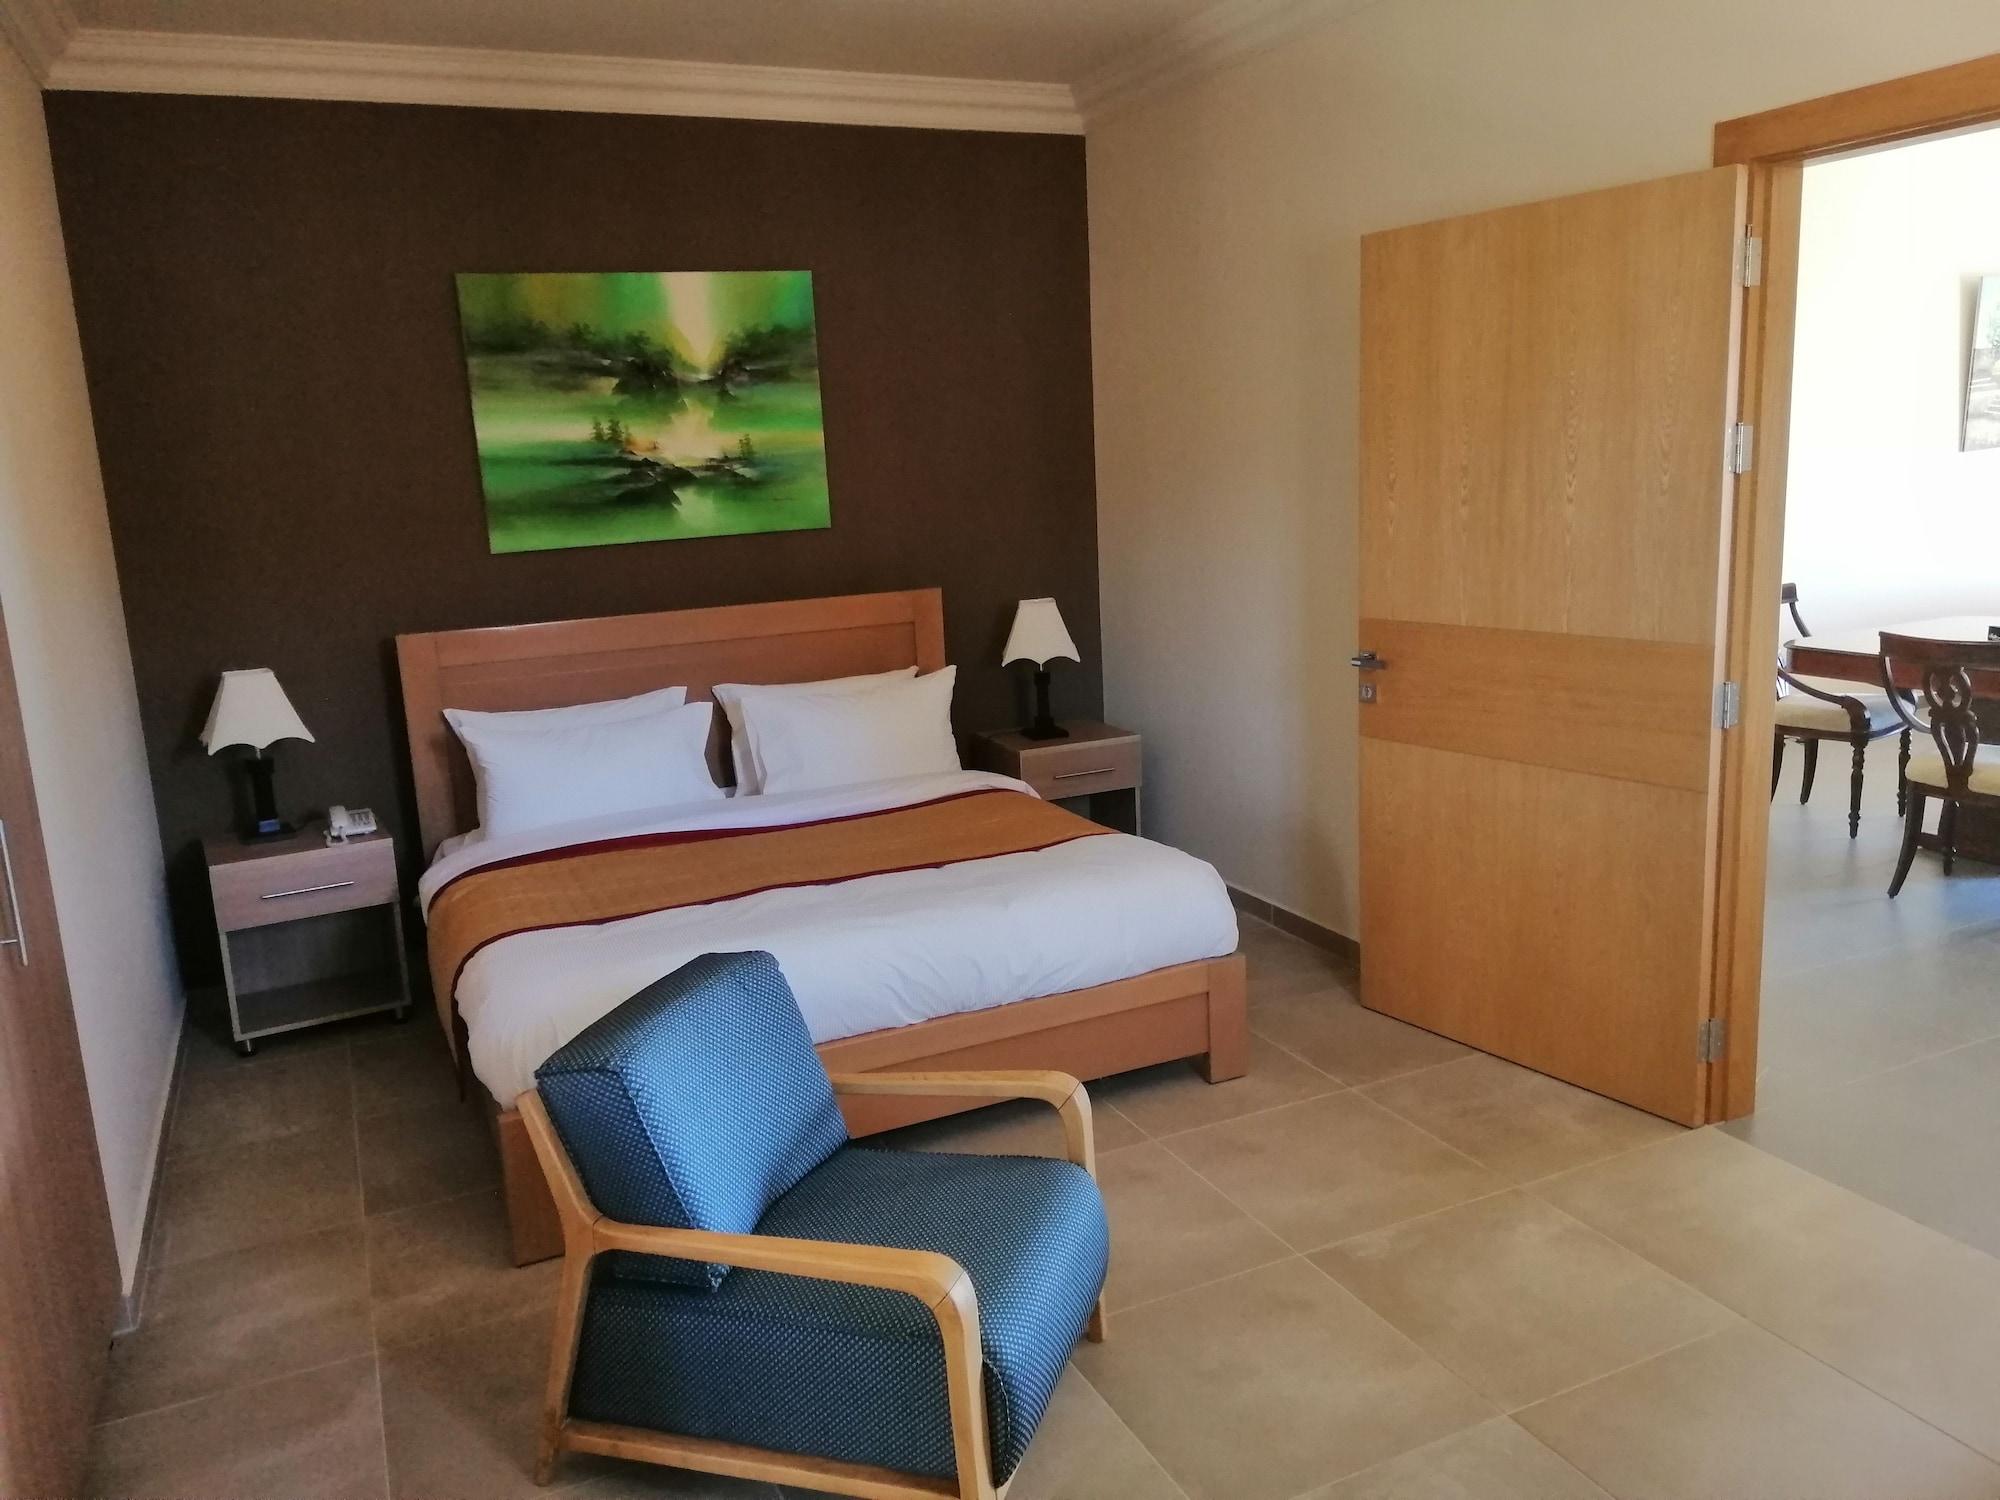 Zahle Hills Hotel, Zahleh